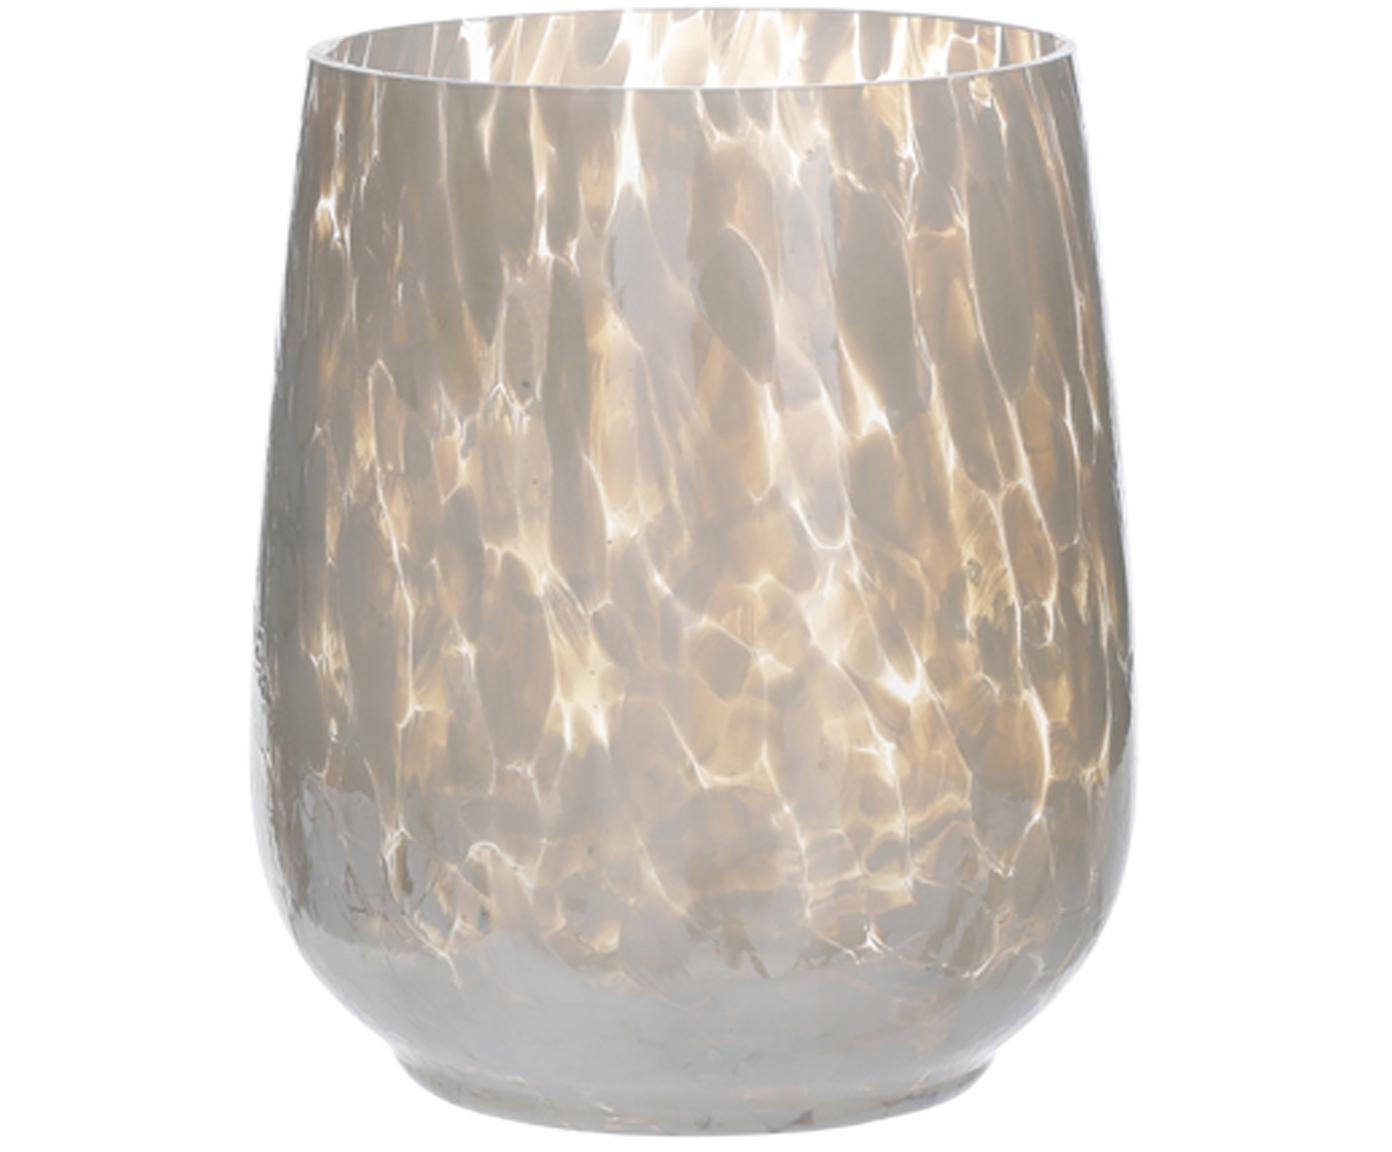 Portacandela in vetro Gunia, Vetro, Bianco latteo, Ø 9 x Alt. 12 cm